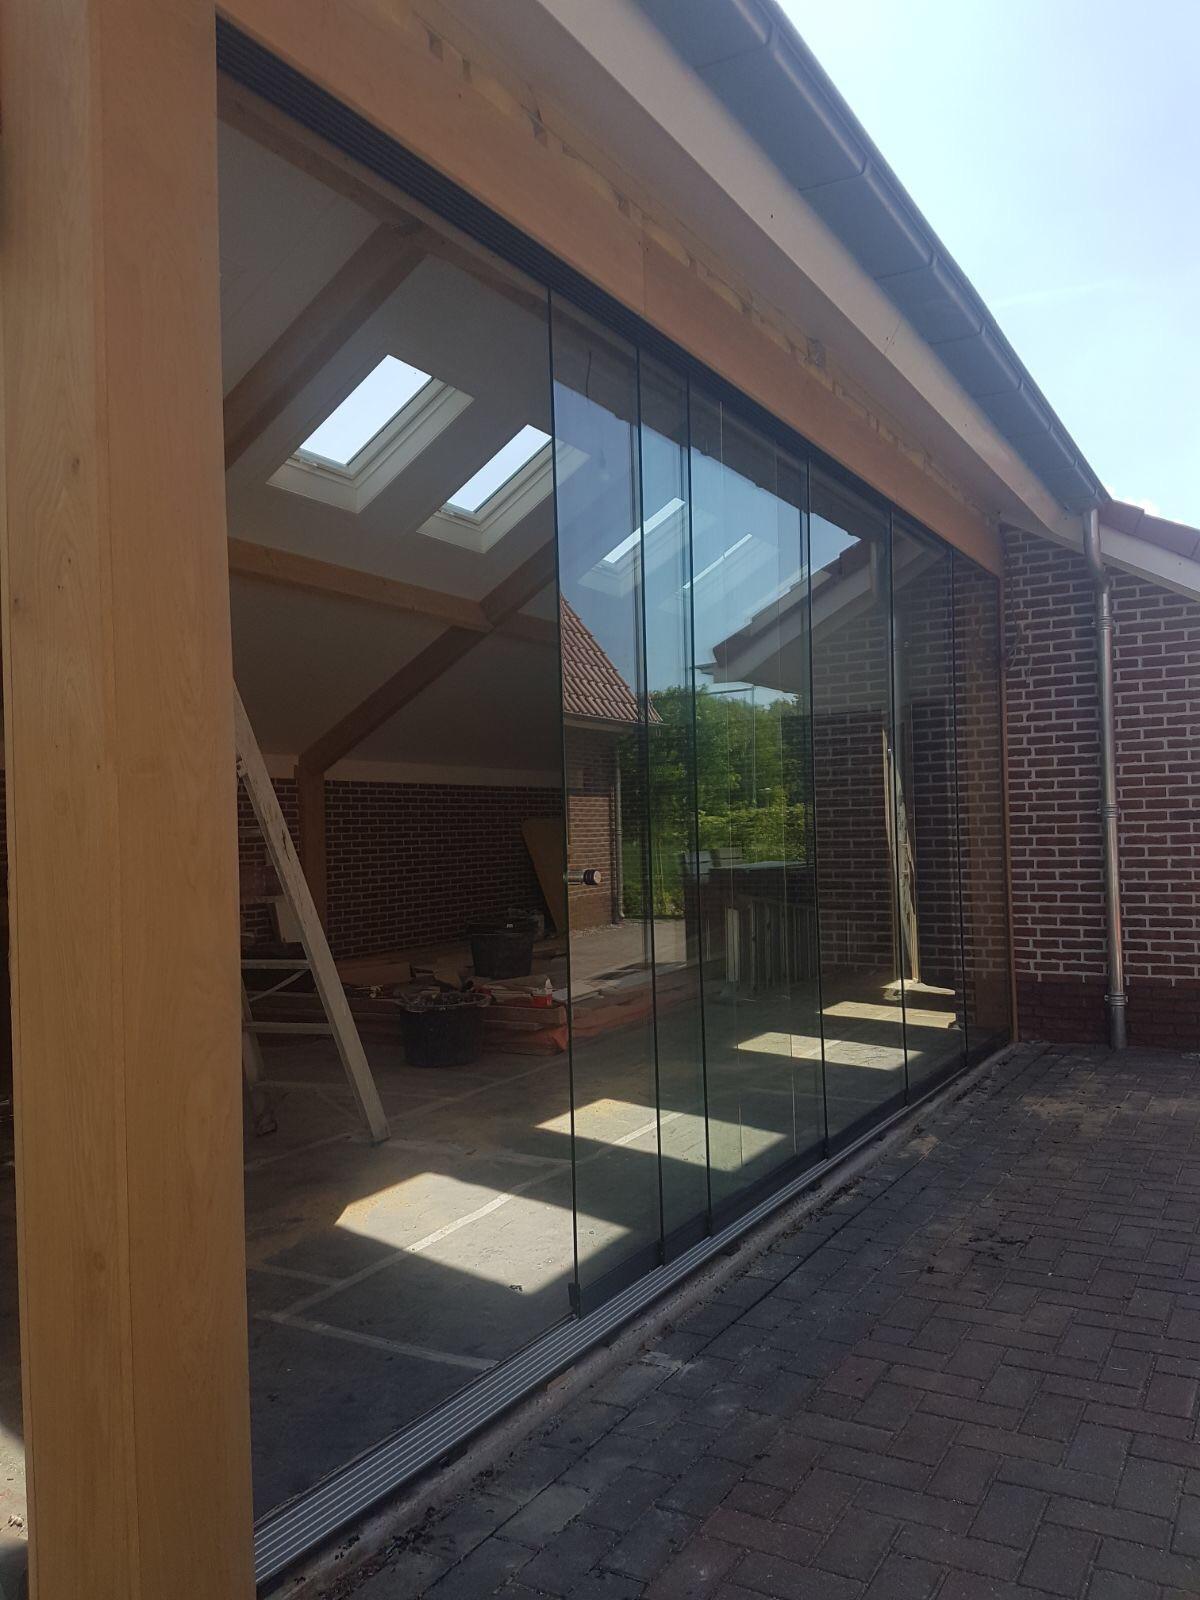 Alufox Schuifwanden Glas Houten schuin dak